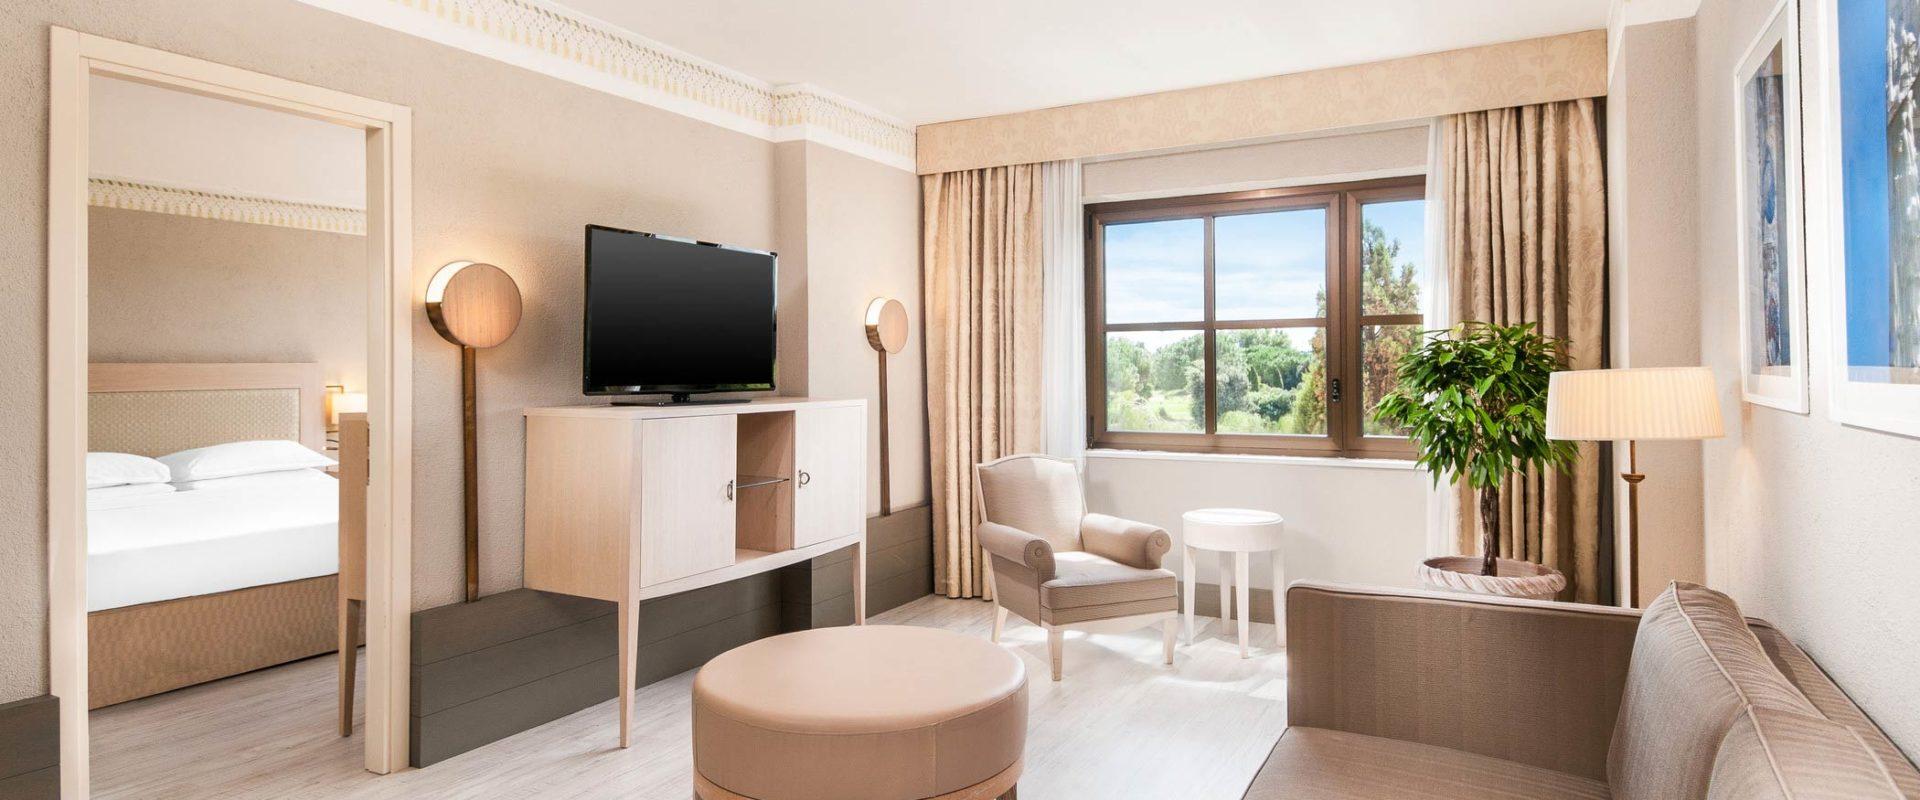 Sheraton-Parco-de-Medici-Rome-Senior-Suite